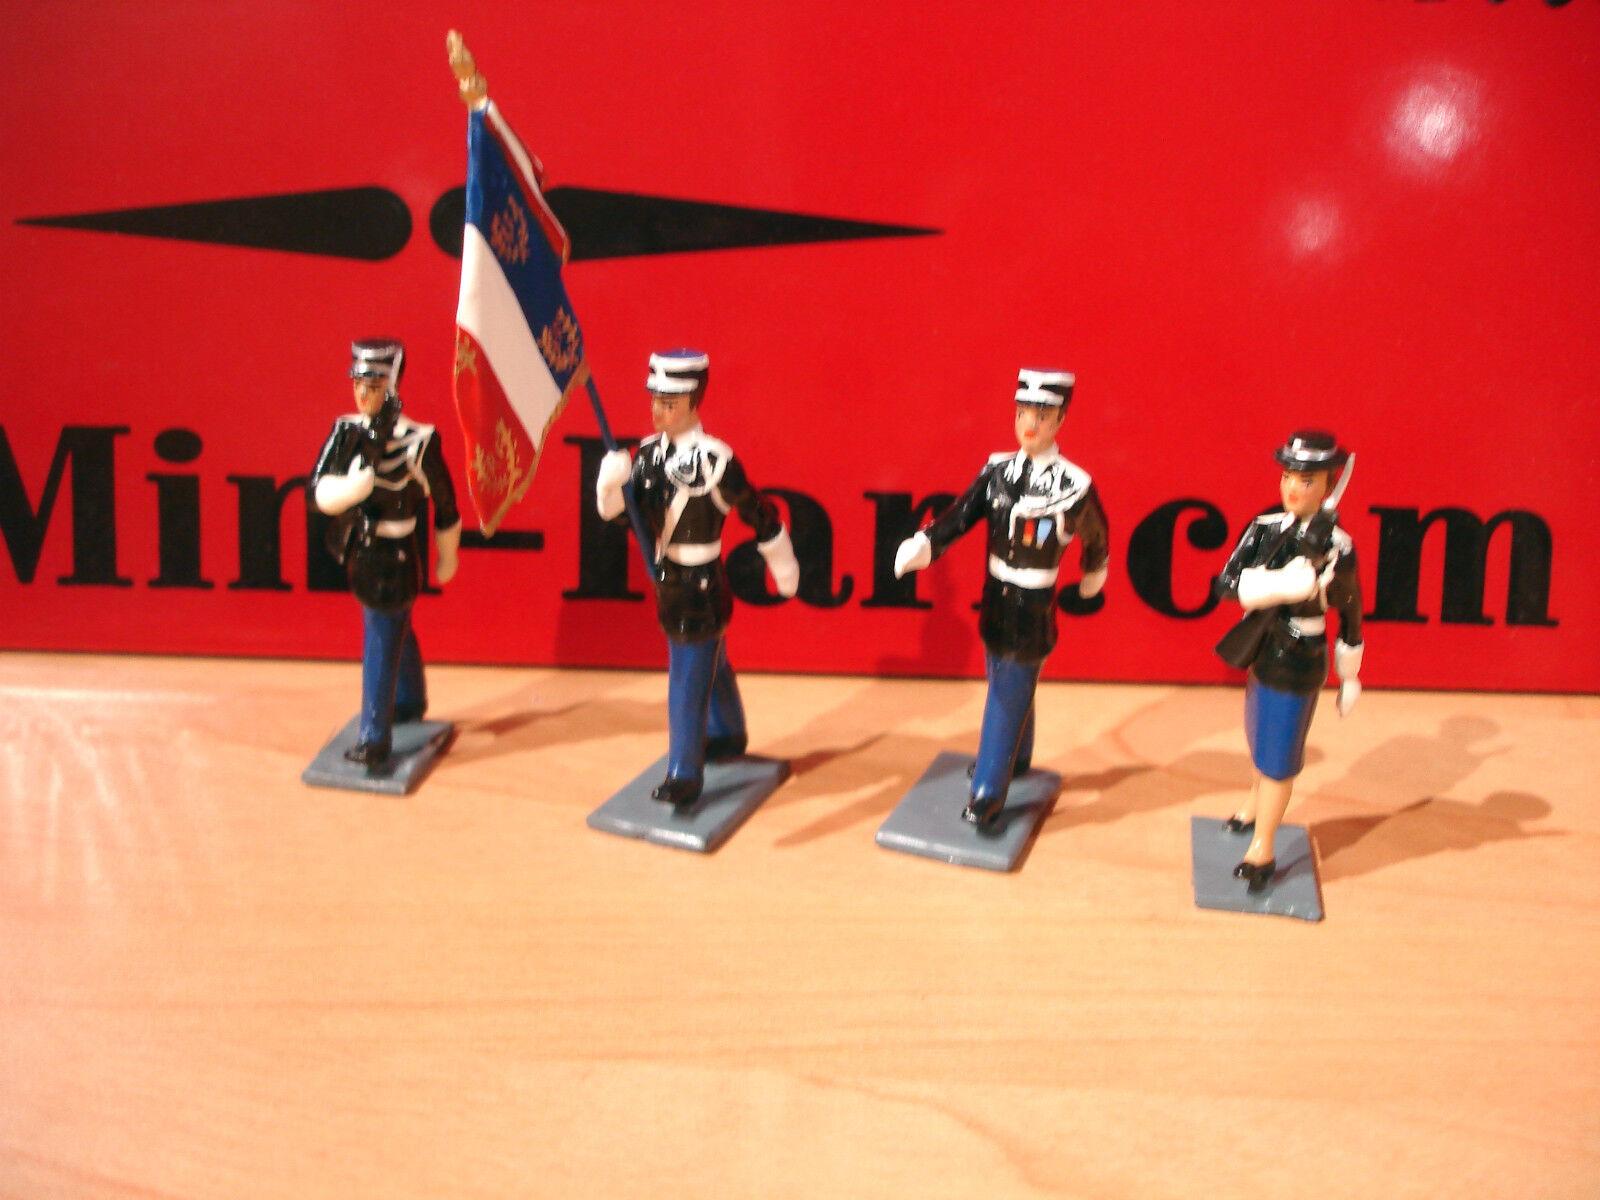 CBG mignot Ecole gendarmerie constable  guard flag lead figure toy soldier  distribution globale